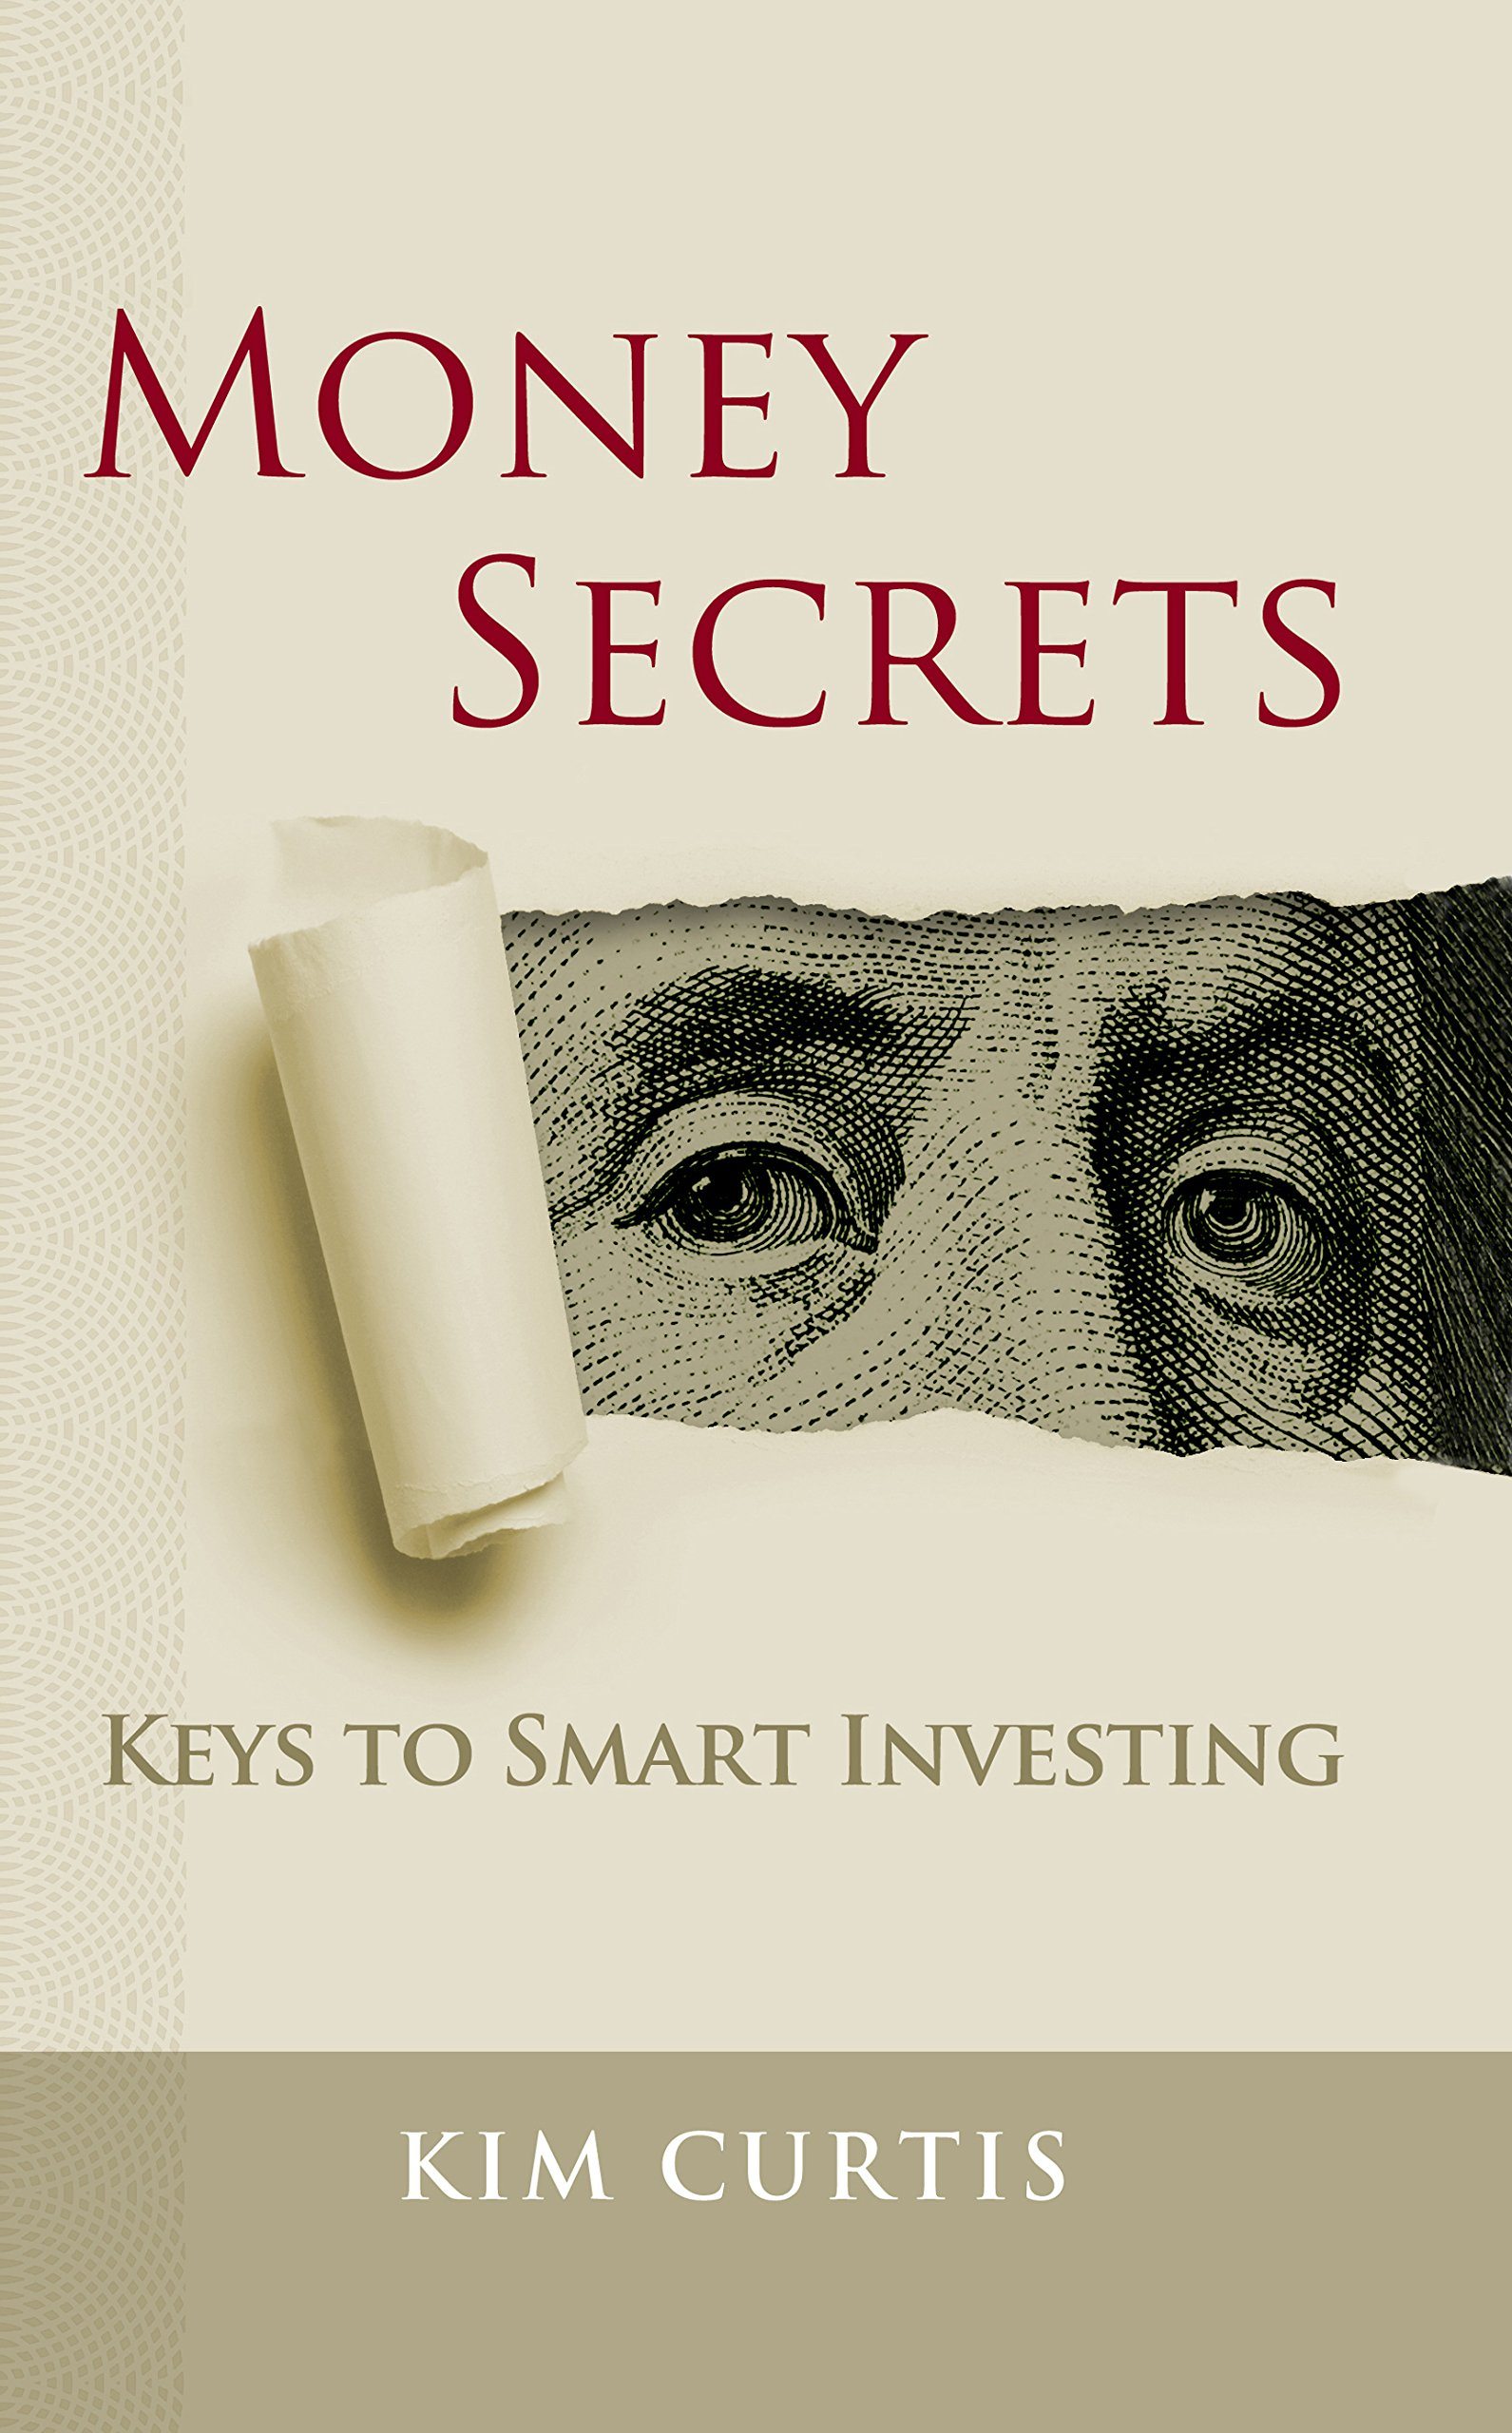 Money Secrets: Keys to Smart Investing